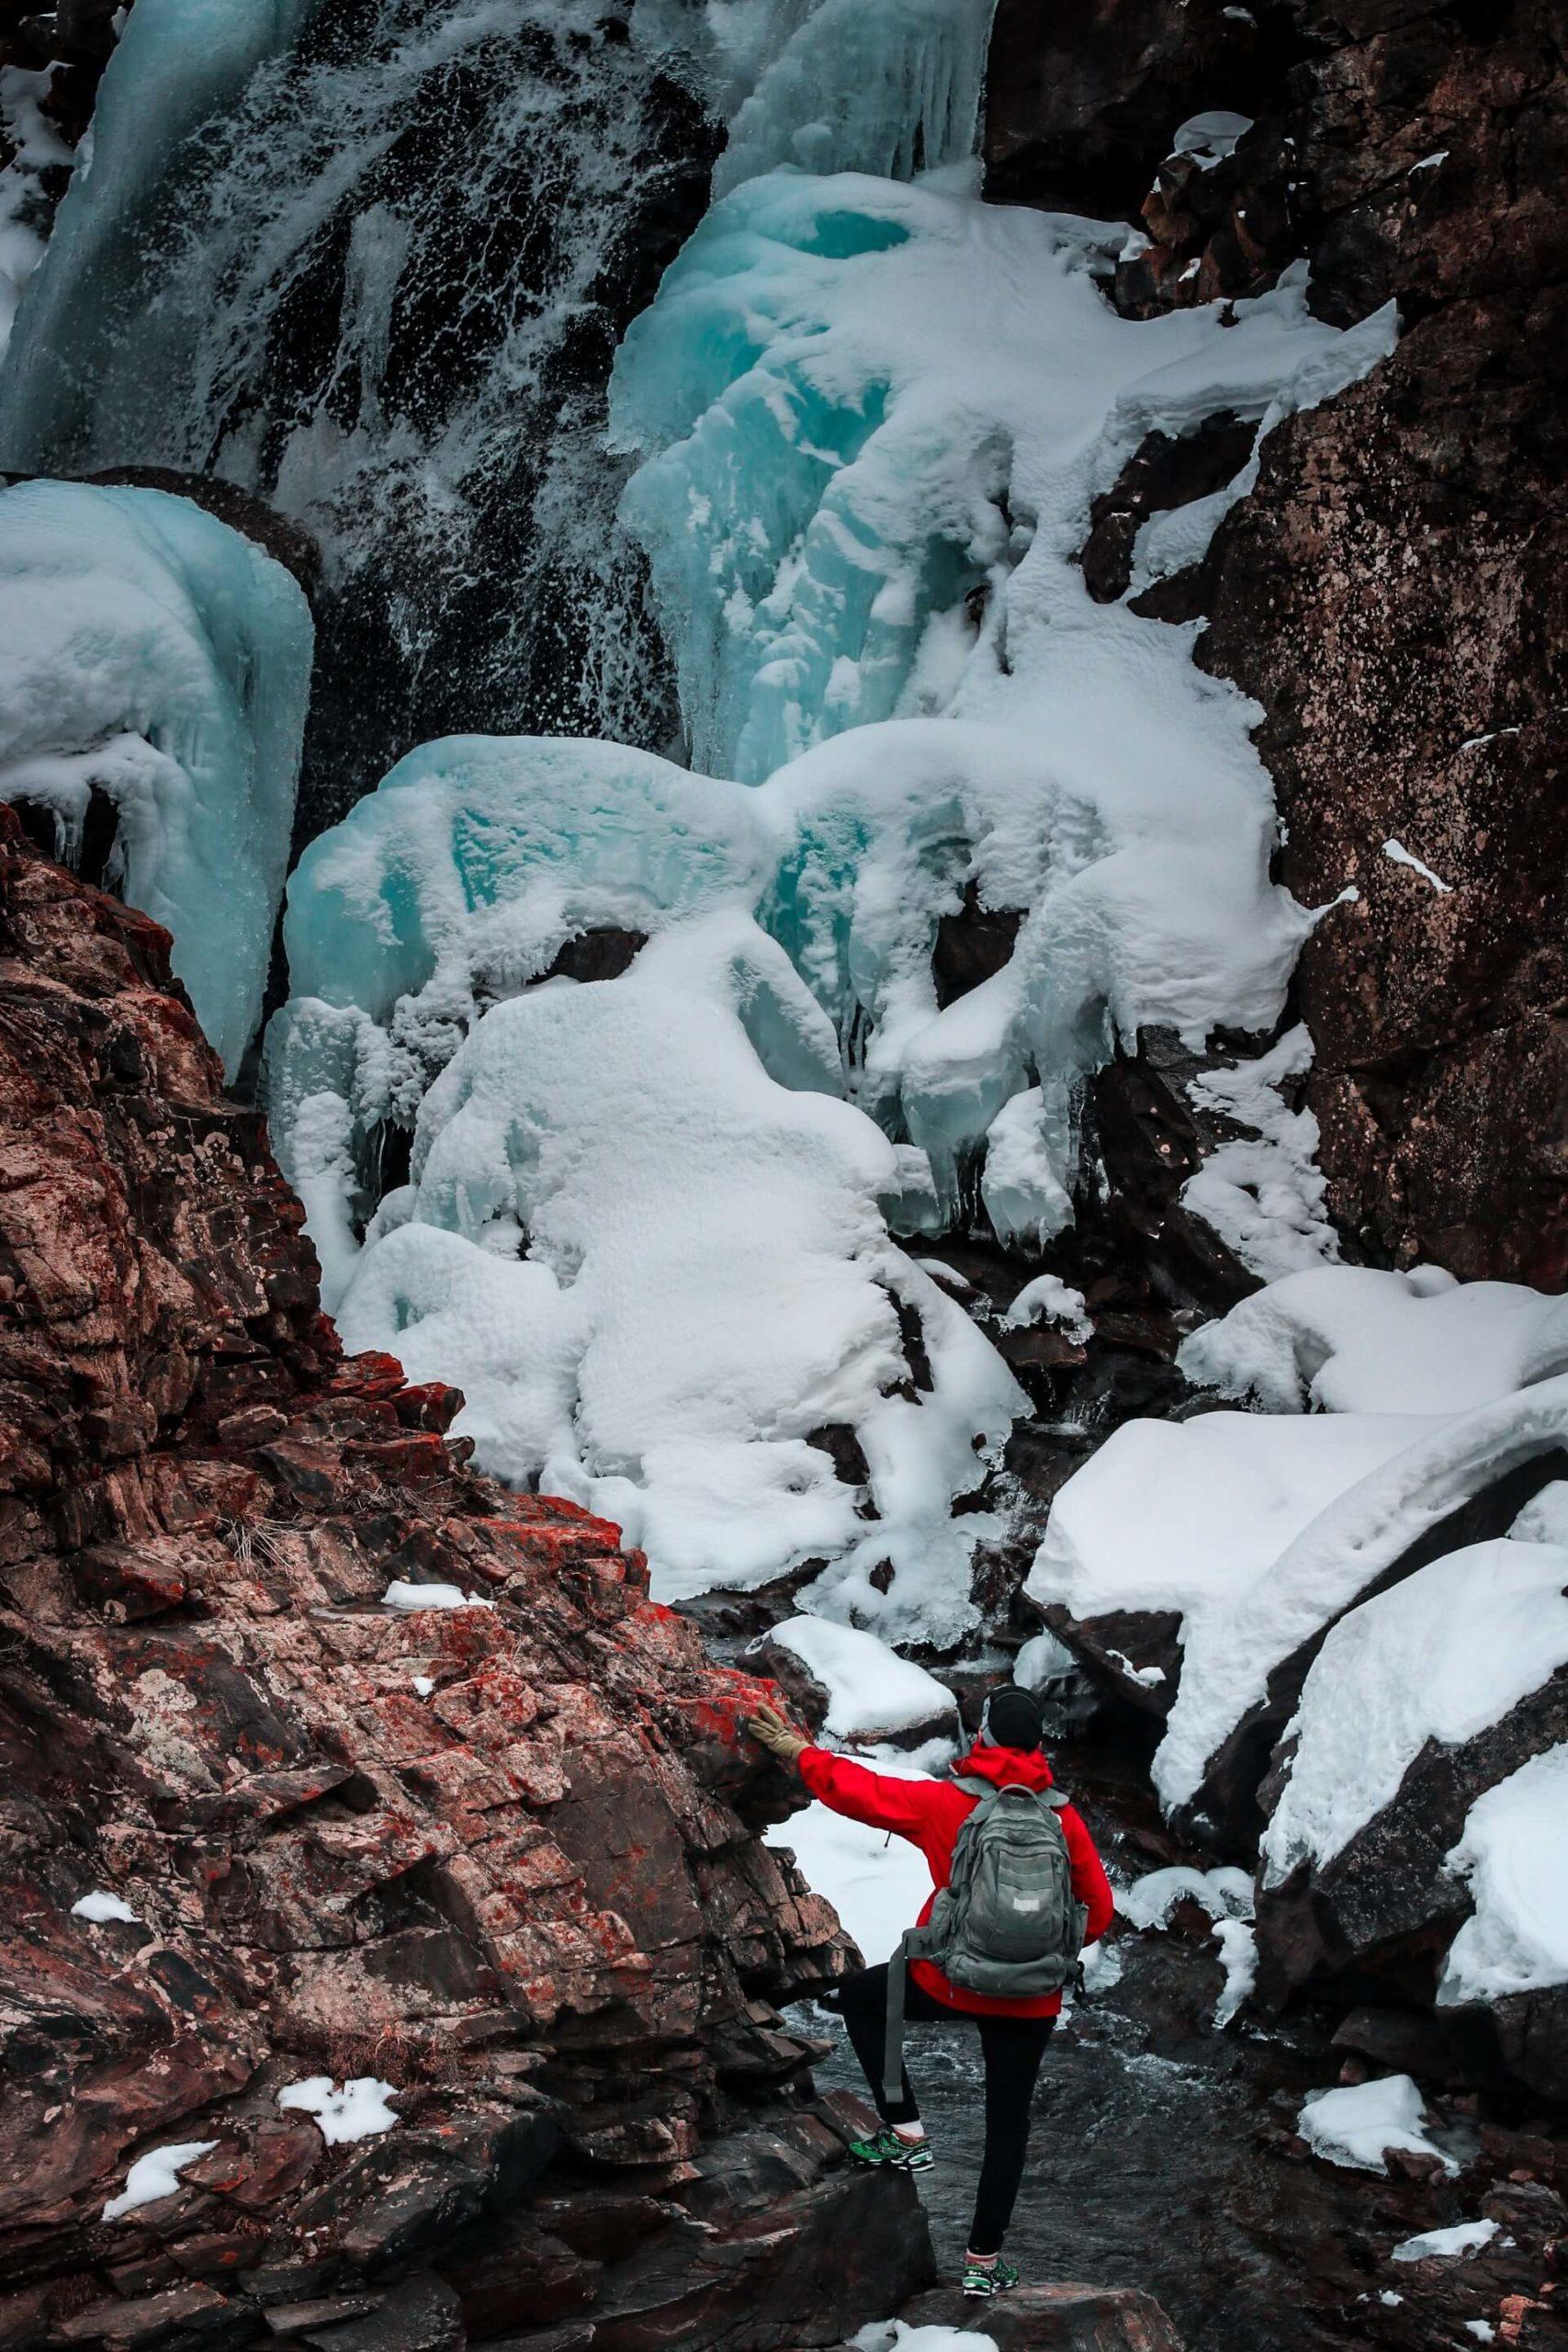 A trekker in Afghanistan stands underneath an ice drift in Panjshir.